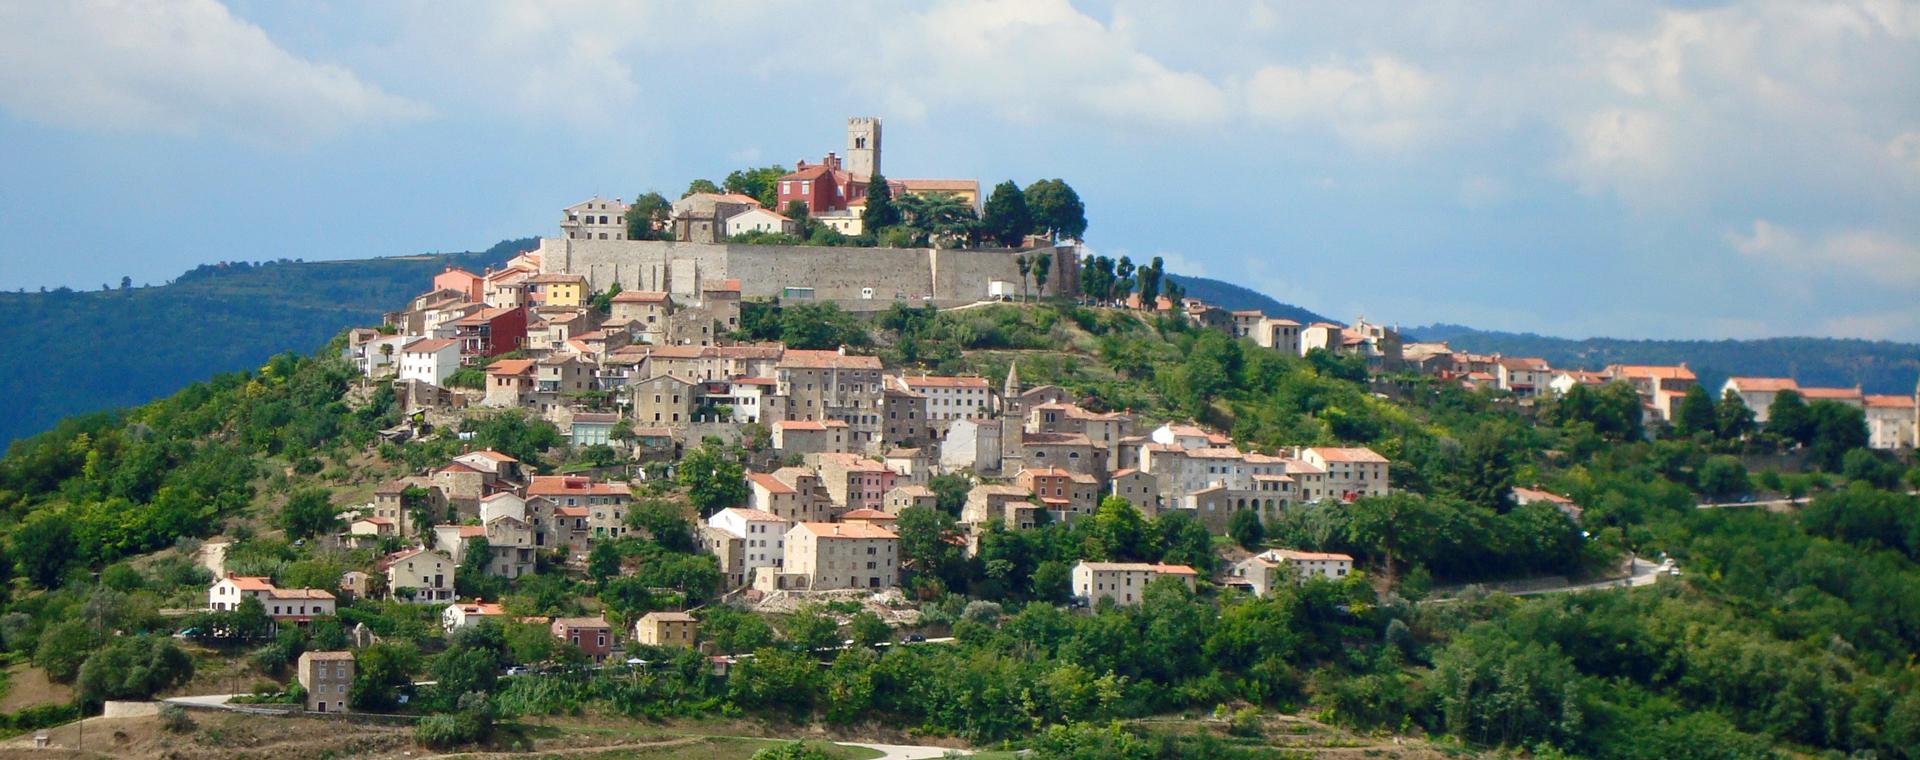 Image Croatie : la péninsule de l'Istrie